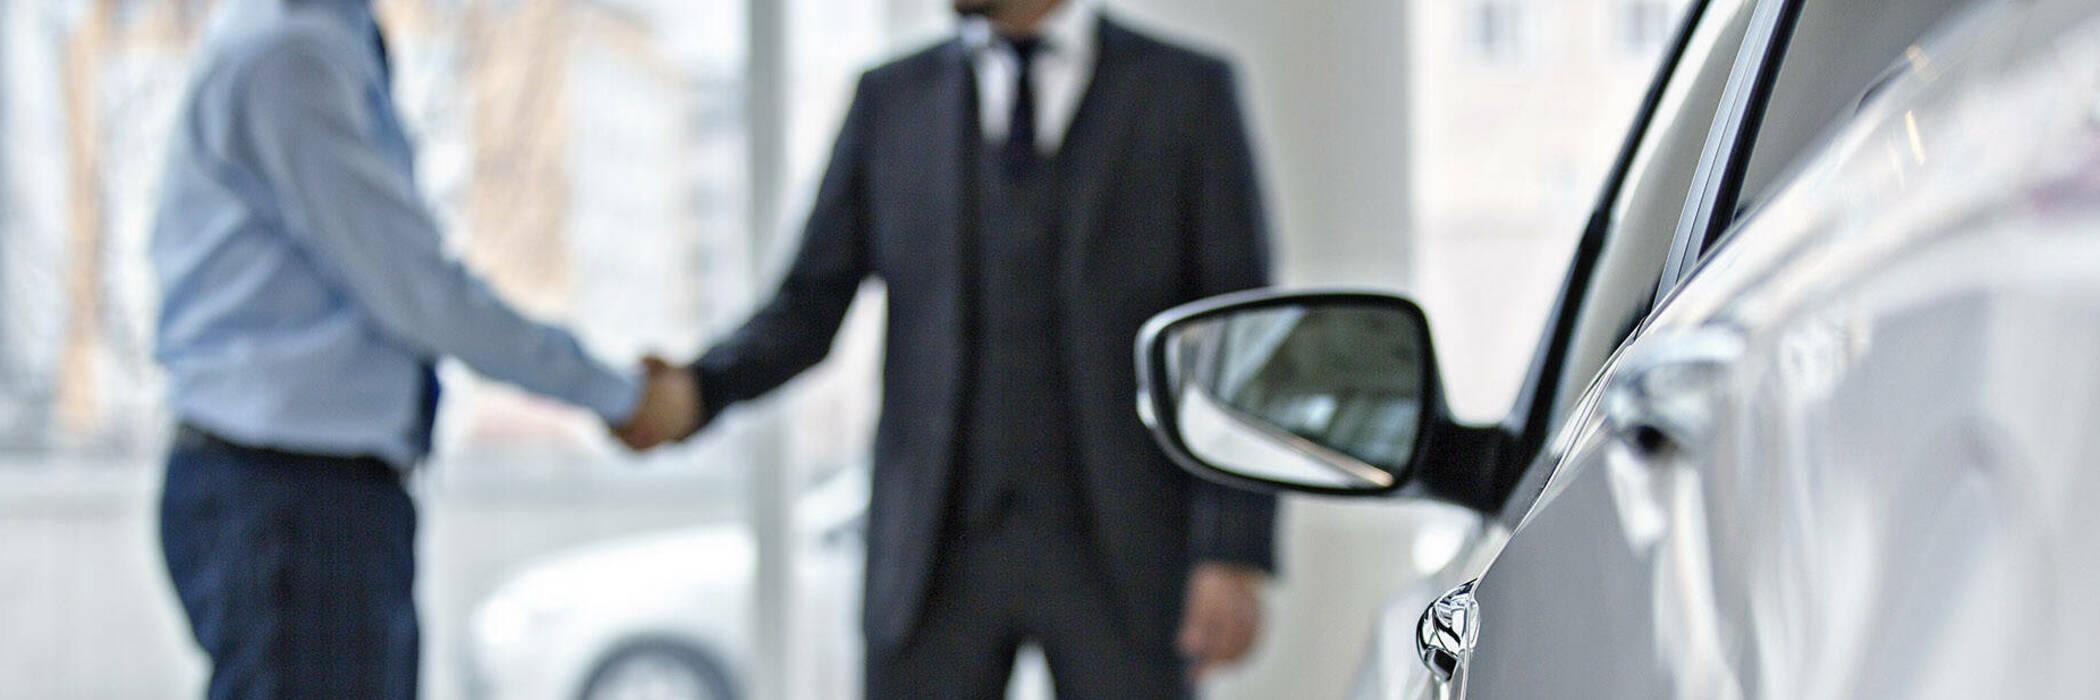 17jan members wins refund for vehicle costs hero